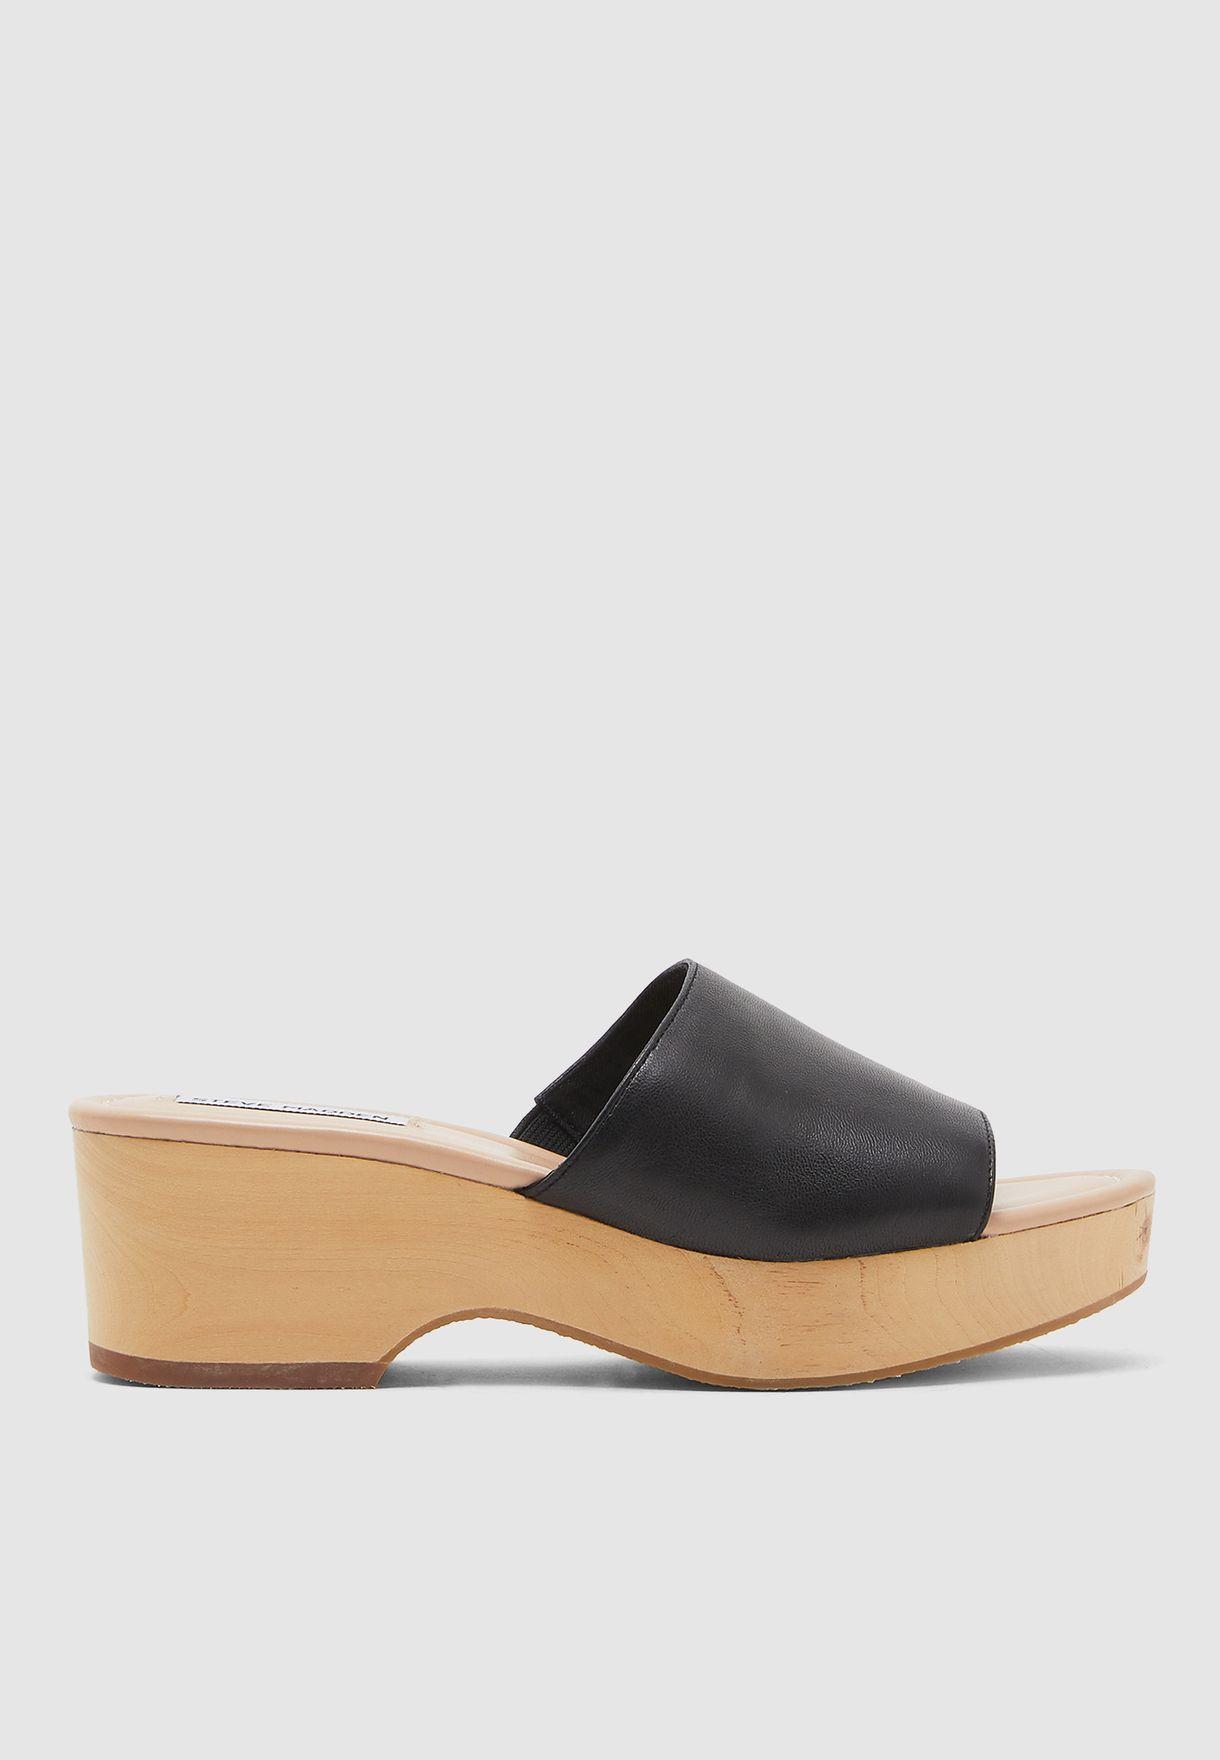 Clarke Single Strap High Heel Sandal - Black